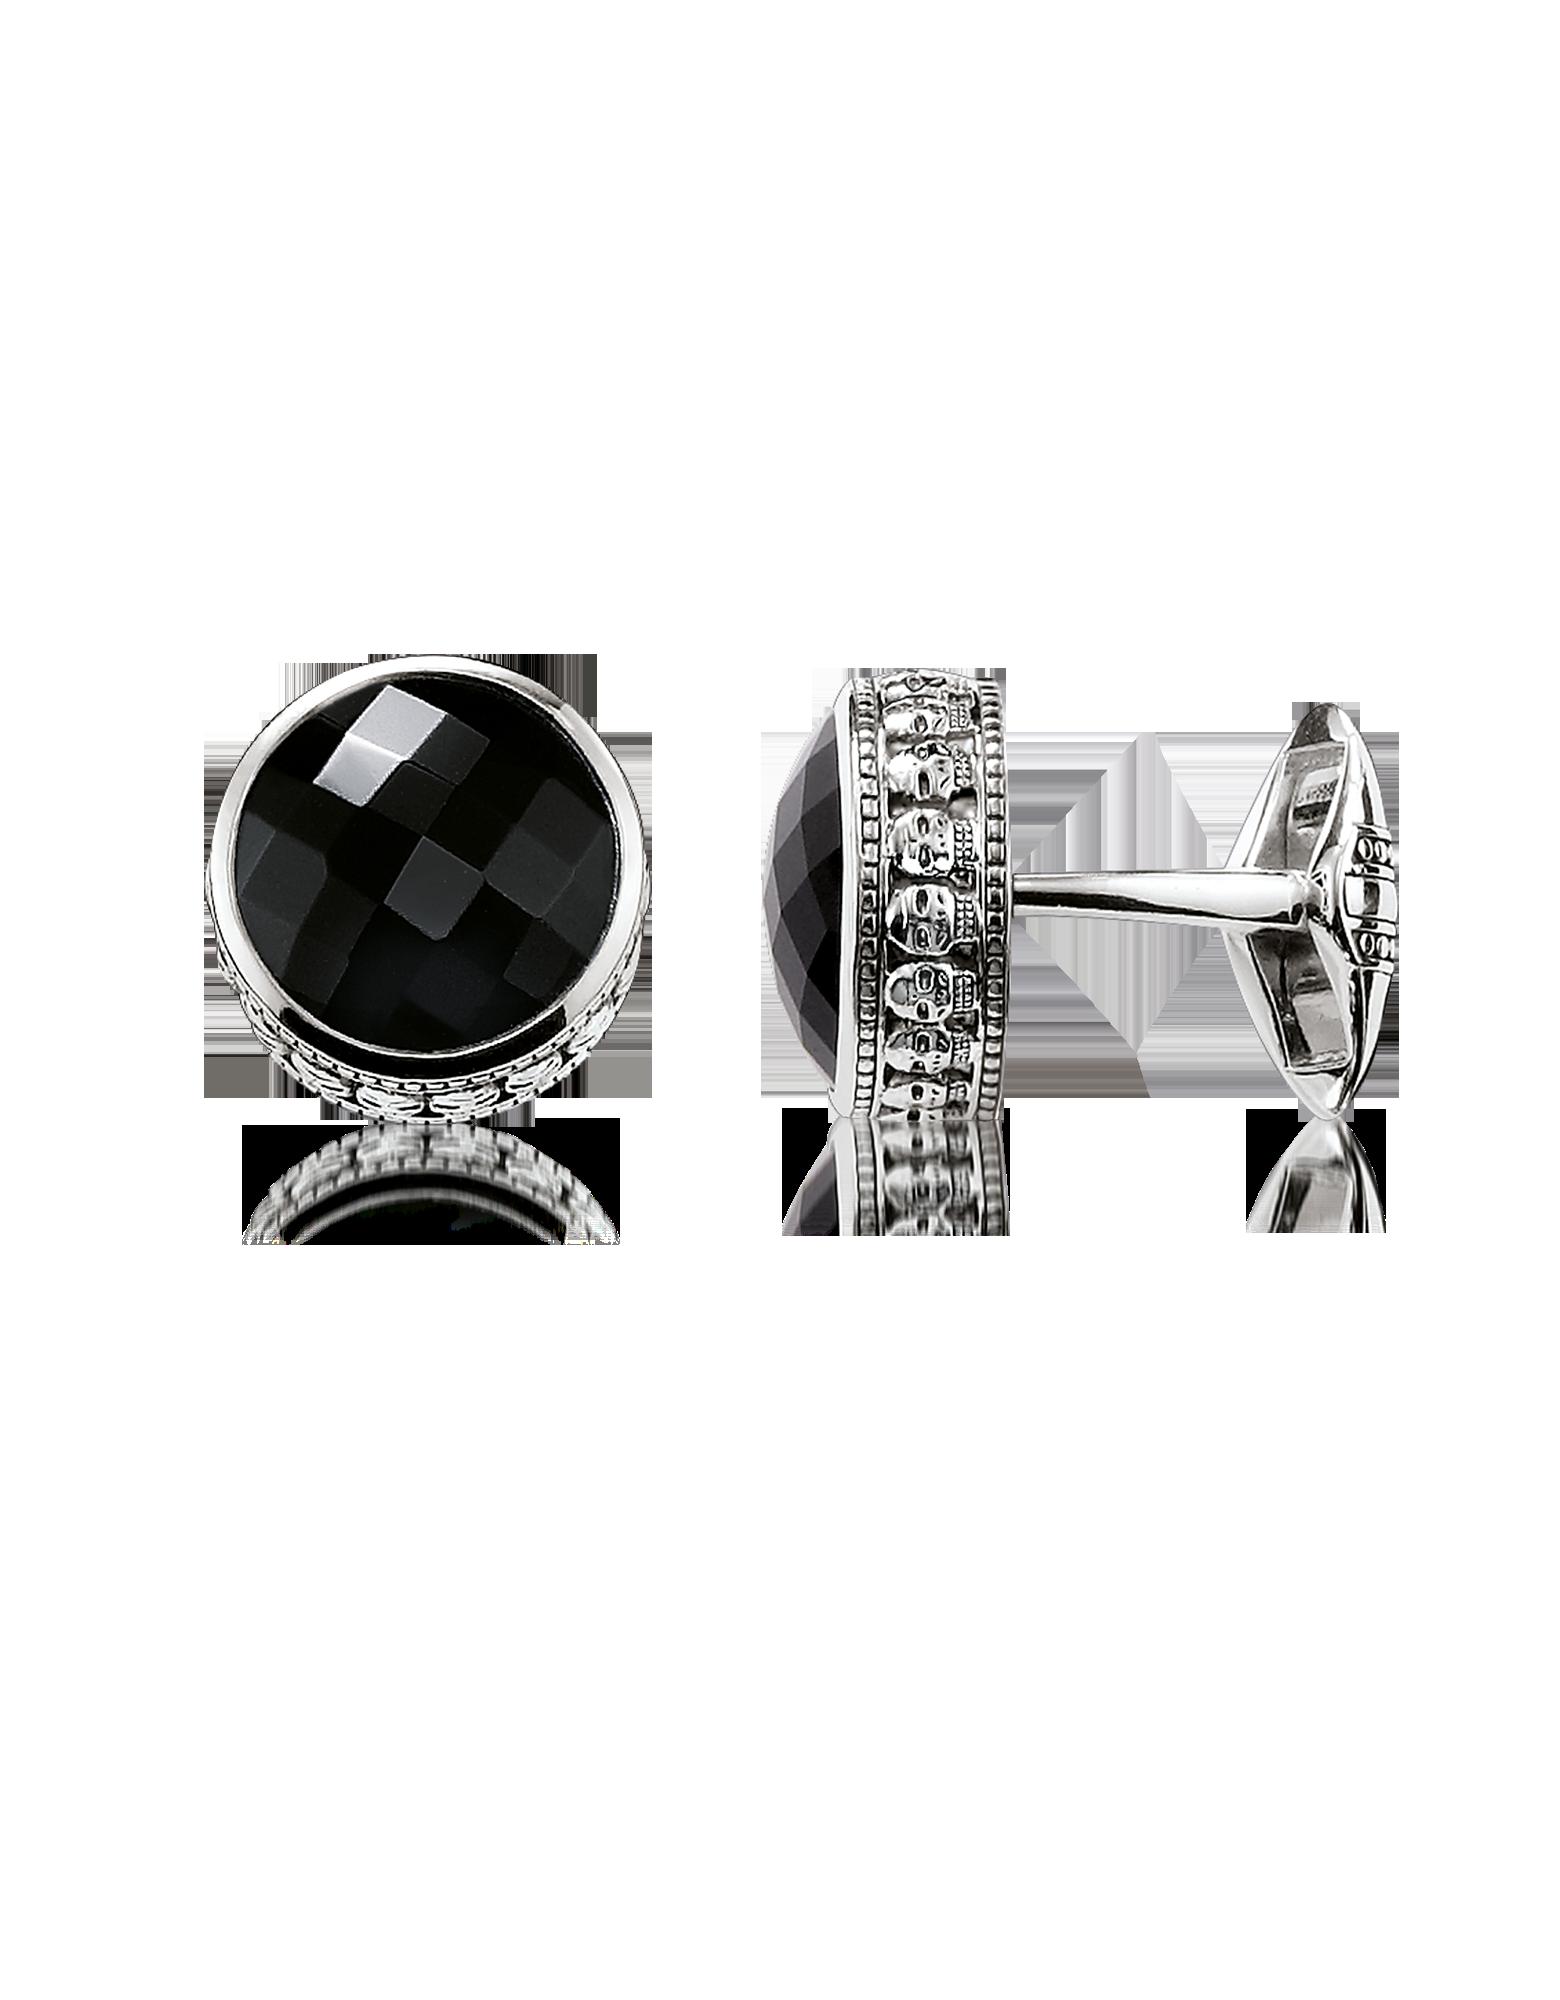 Image of Blackened 925 Sterling silver Skull Cufflinks w/Onyx